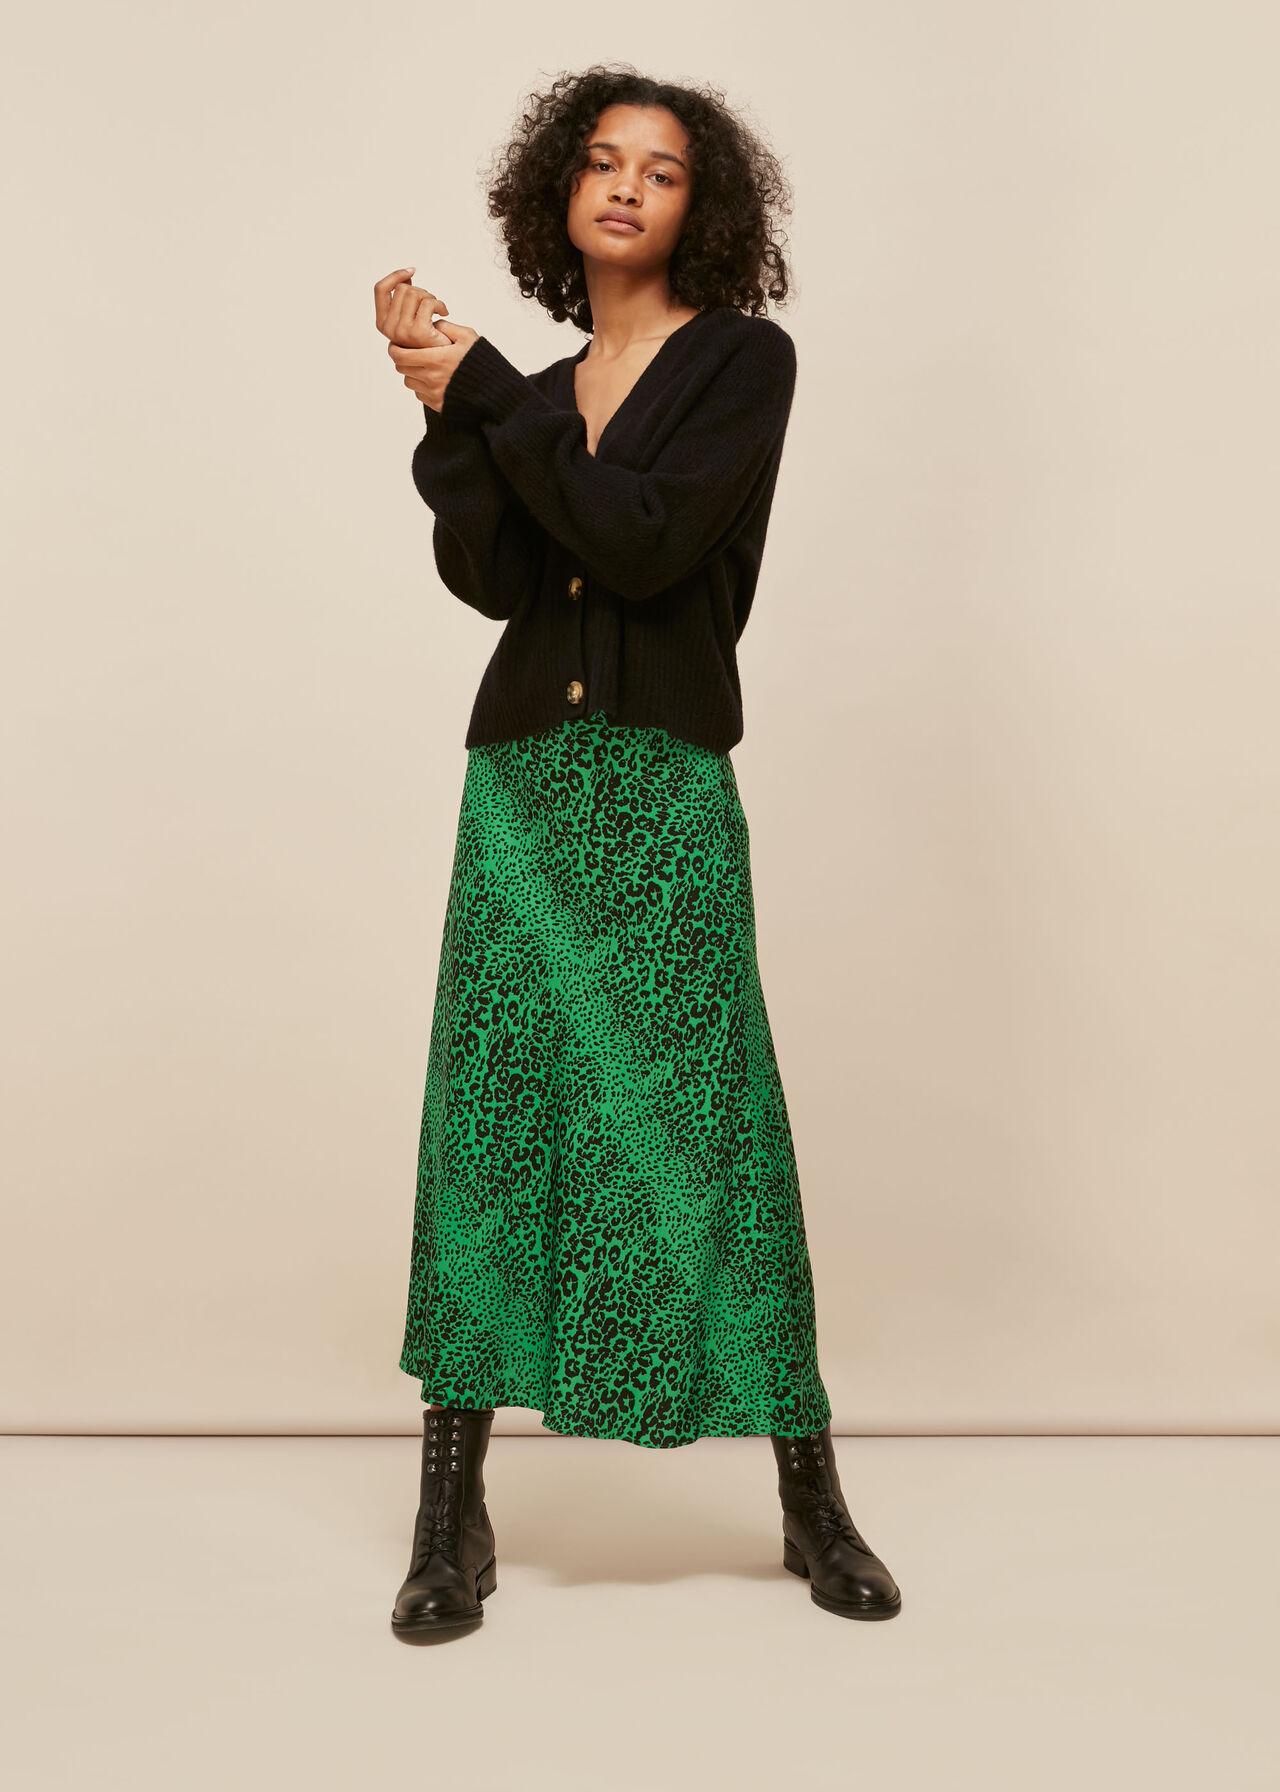 Speckled Animal Bias Cut Skirt